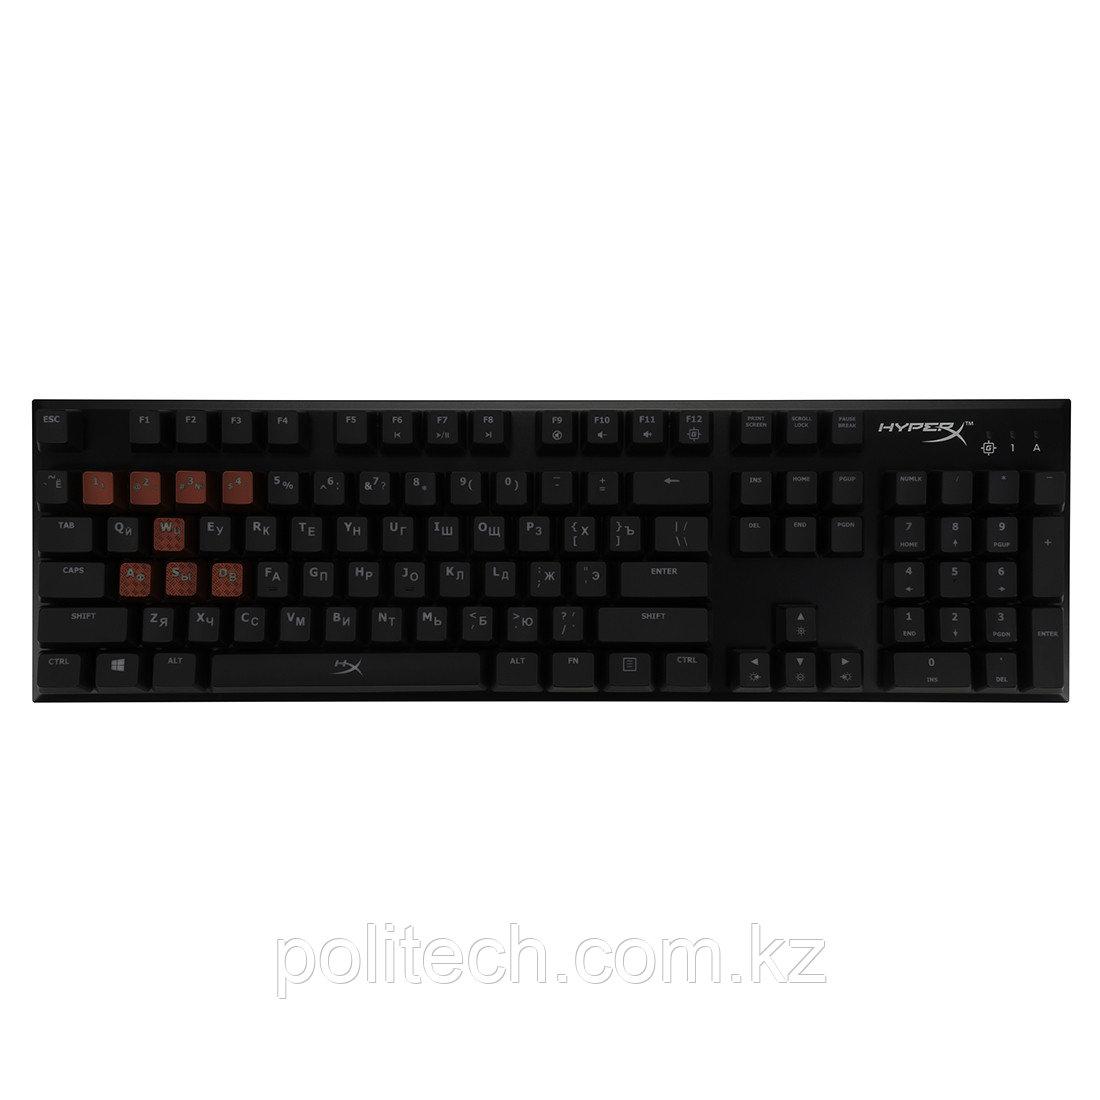 Клавиатура HyperX Alloy FPS Mechanical Gaming MX Red HX-KB1RD1-RU/A5